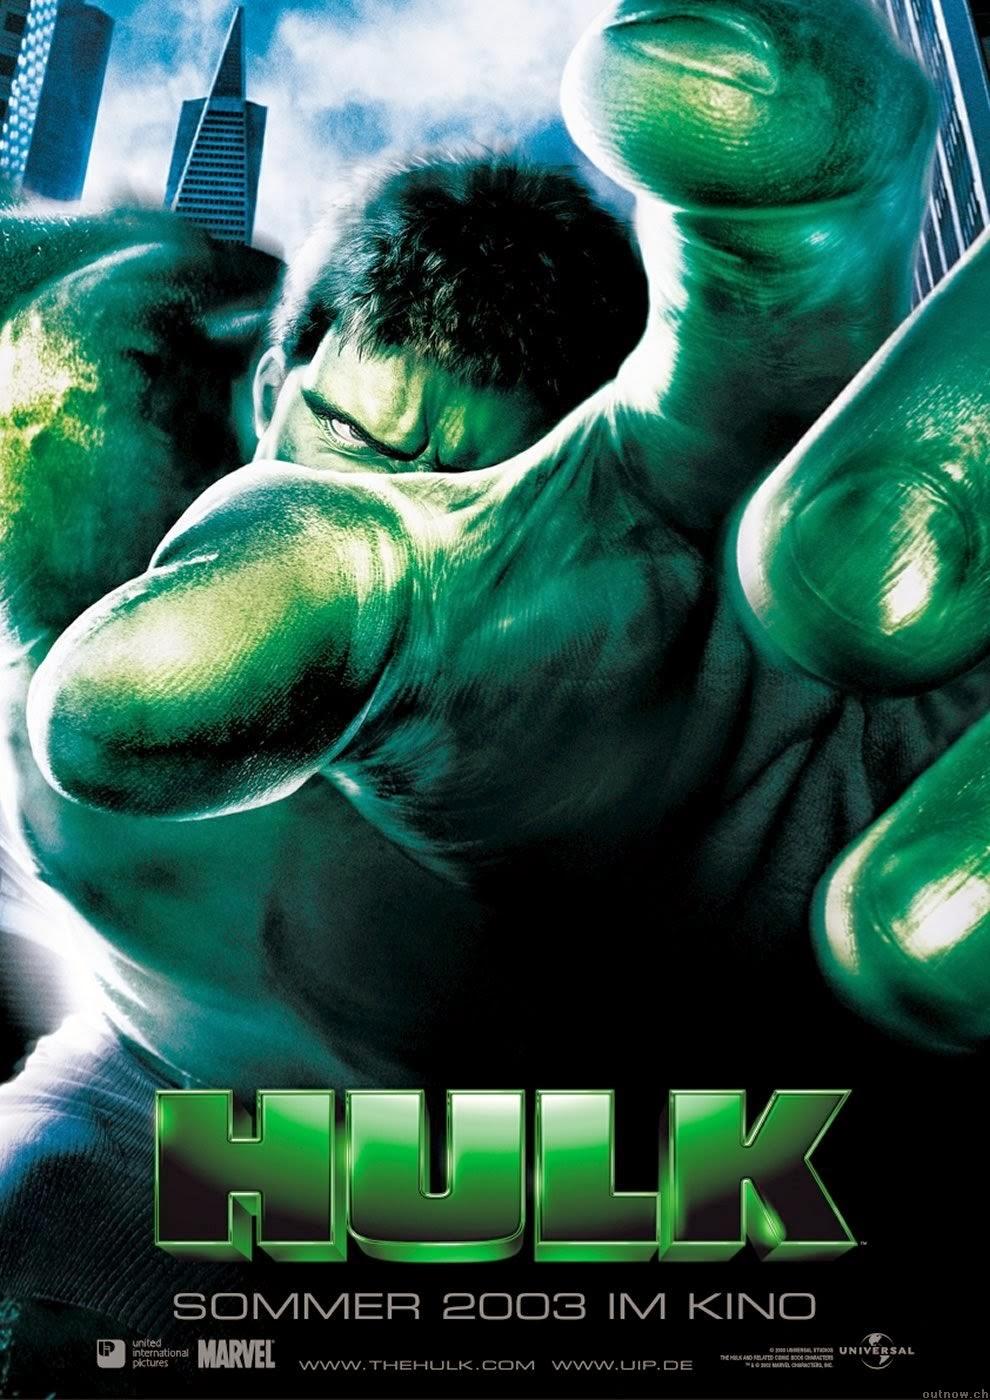 The Hulk 1 มนุษย์ยักษ์จอมพลัง 1 [HD][พากย์ไทย]